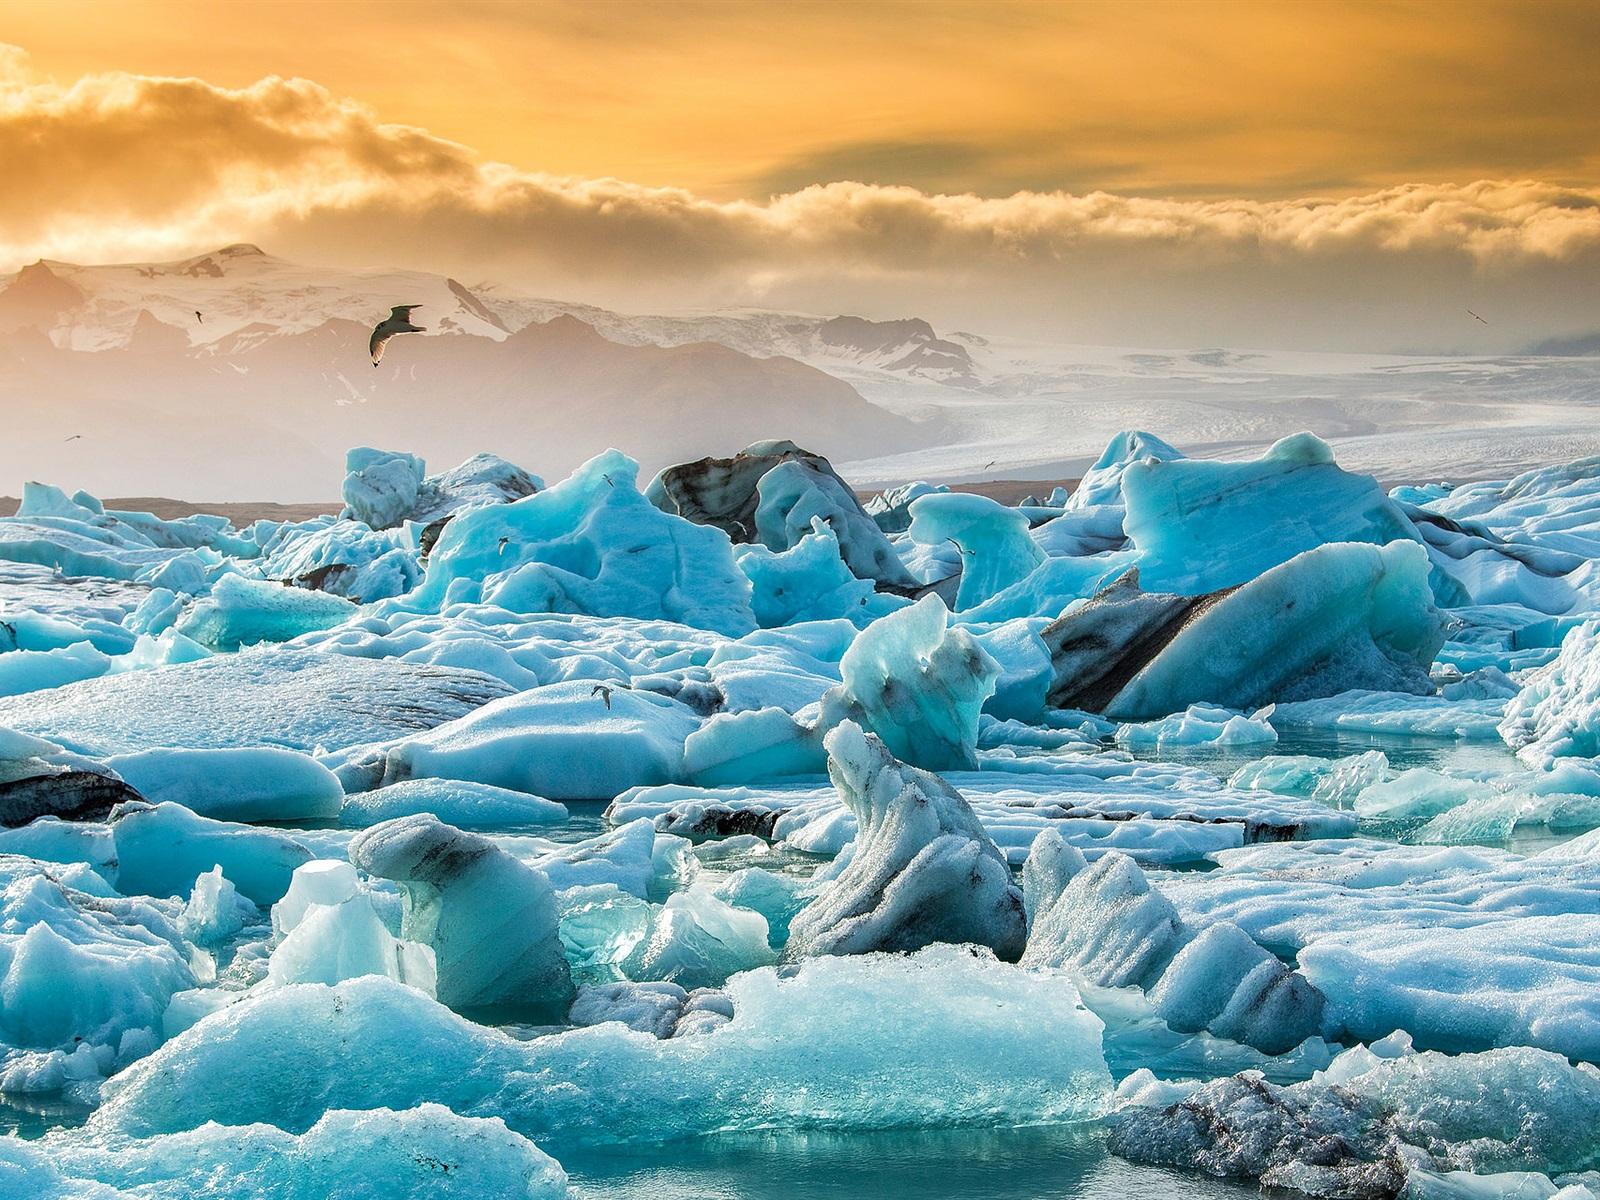 Wallpaper Iceland Jokulsarlon Glacier Blue Ice Clouds 1920x1200